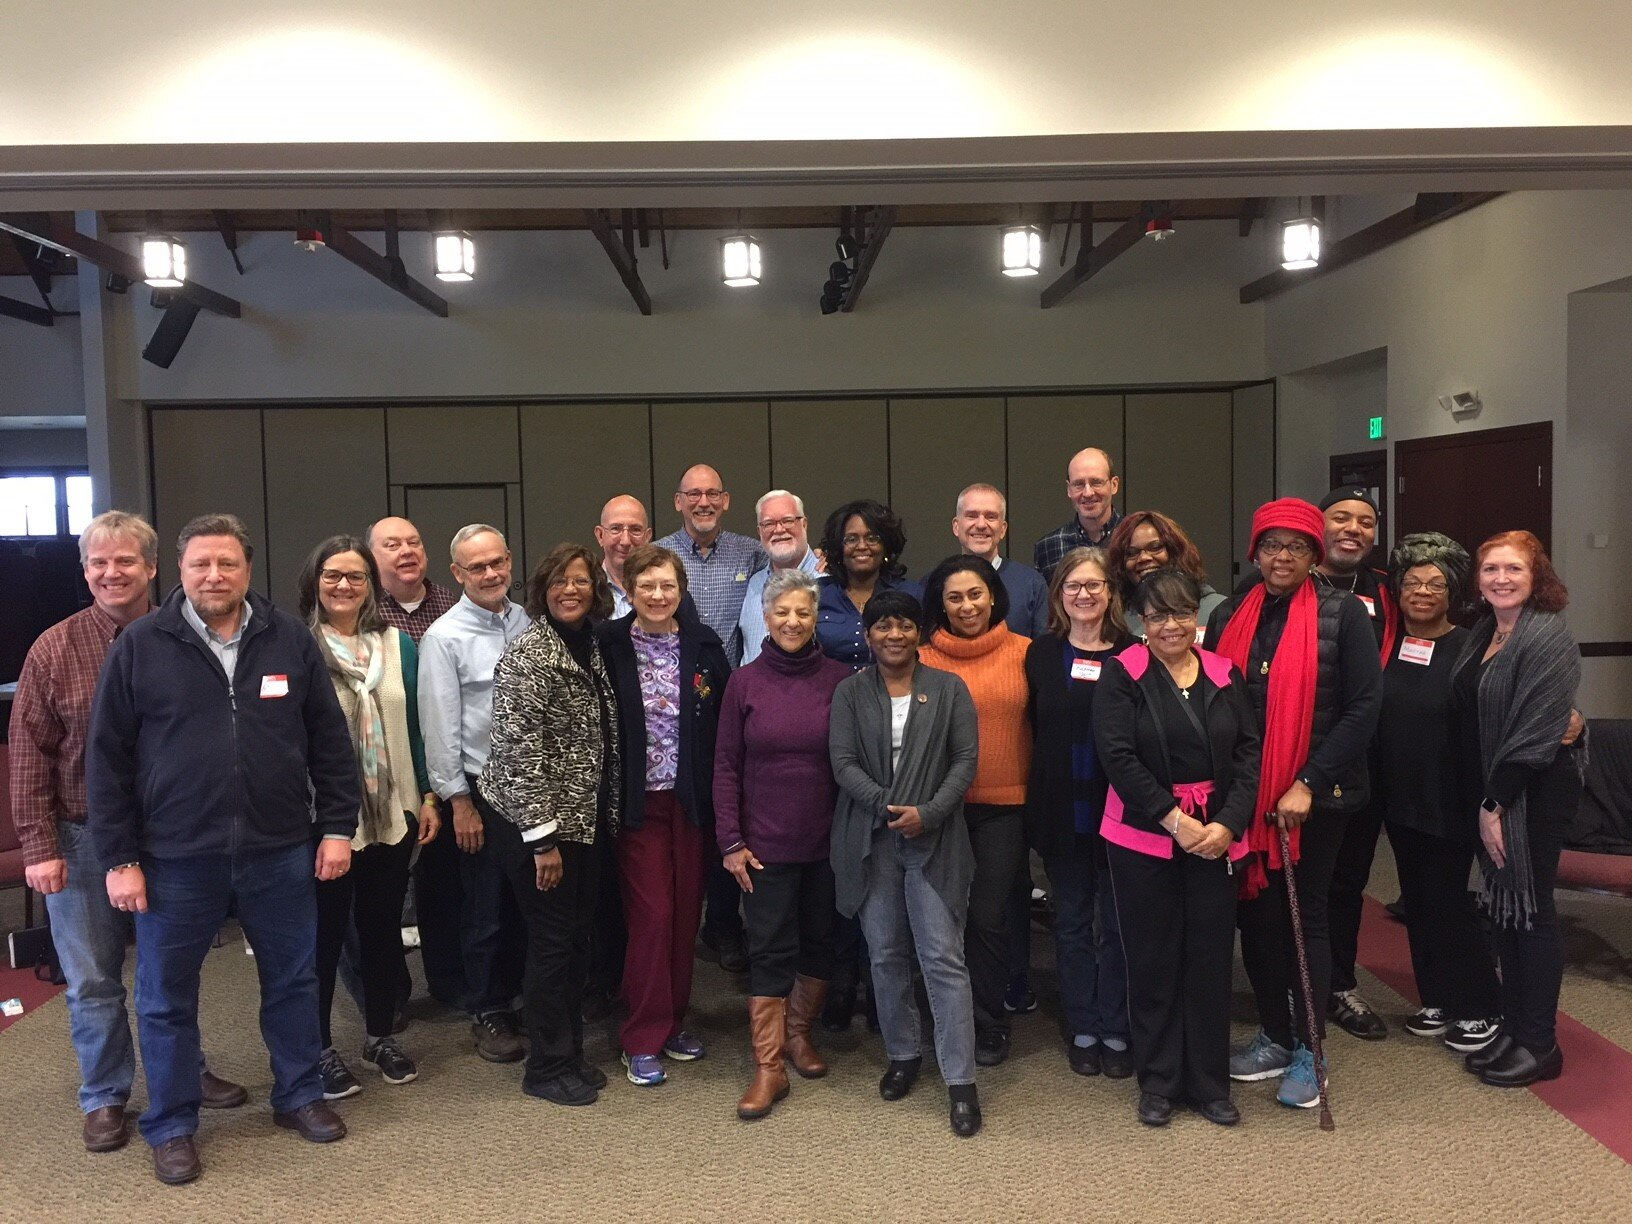 Clergy Spiritual Renewal Retreat, February 2017